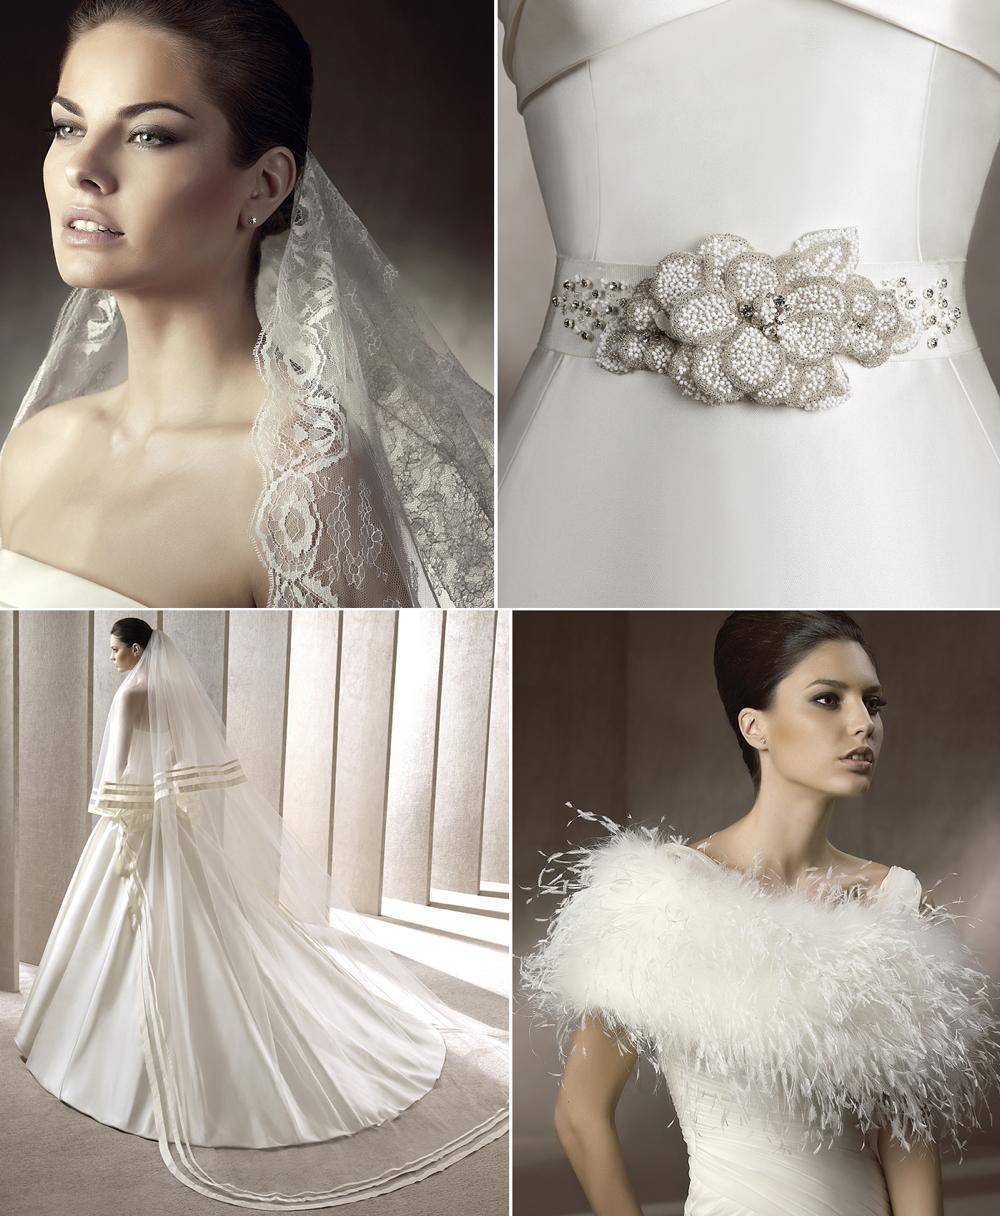 Wedding Dress Accessories Pronovias 2012